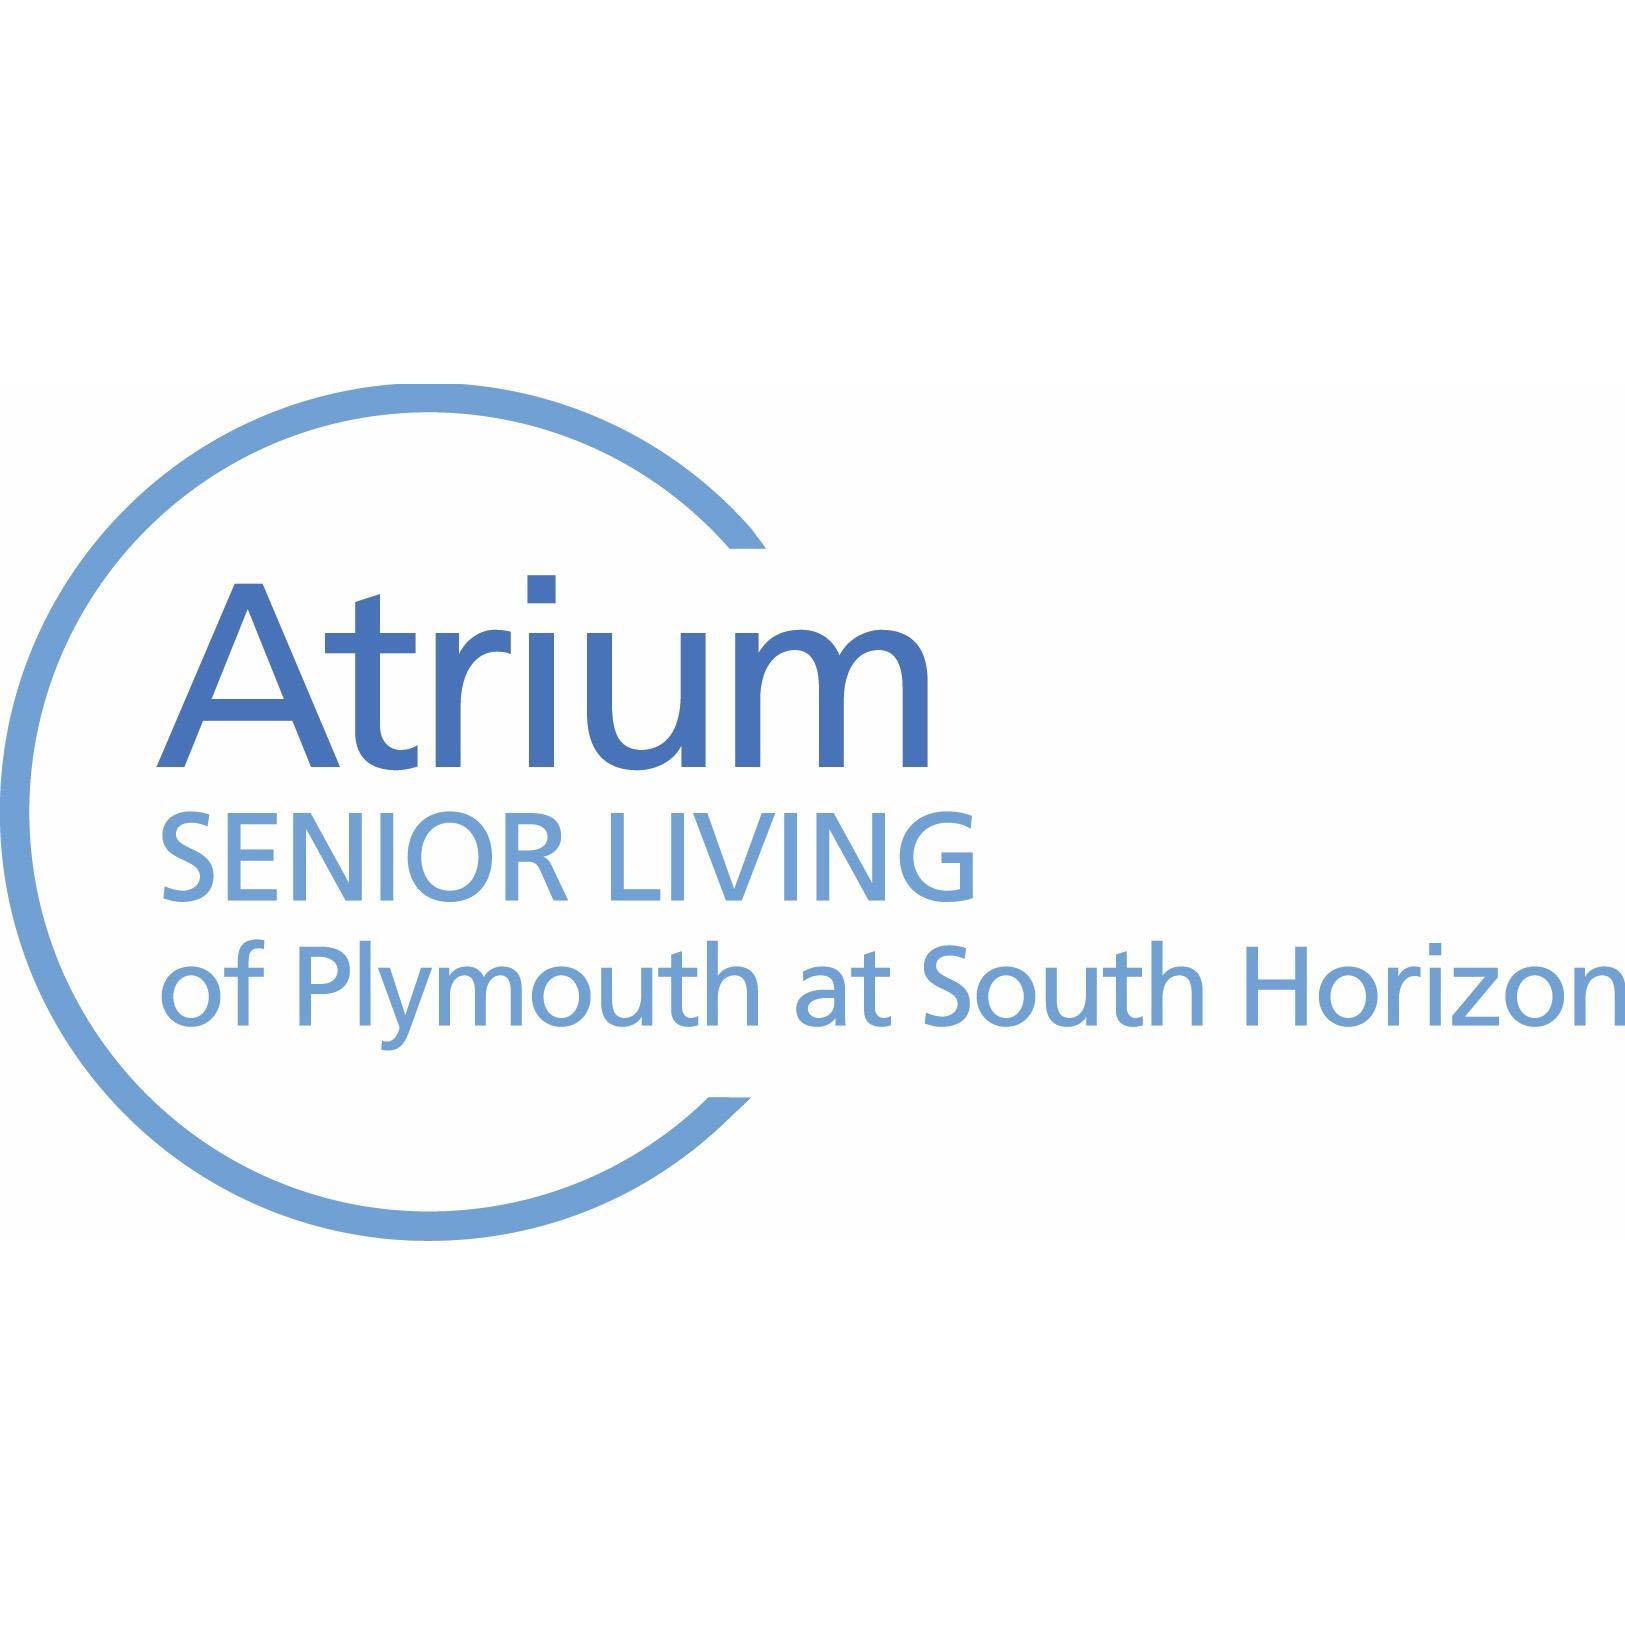 Atrium Senior Living of Plymouth at South Horizon - Plymouth, WI - Retirement Communities